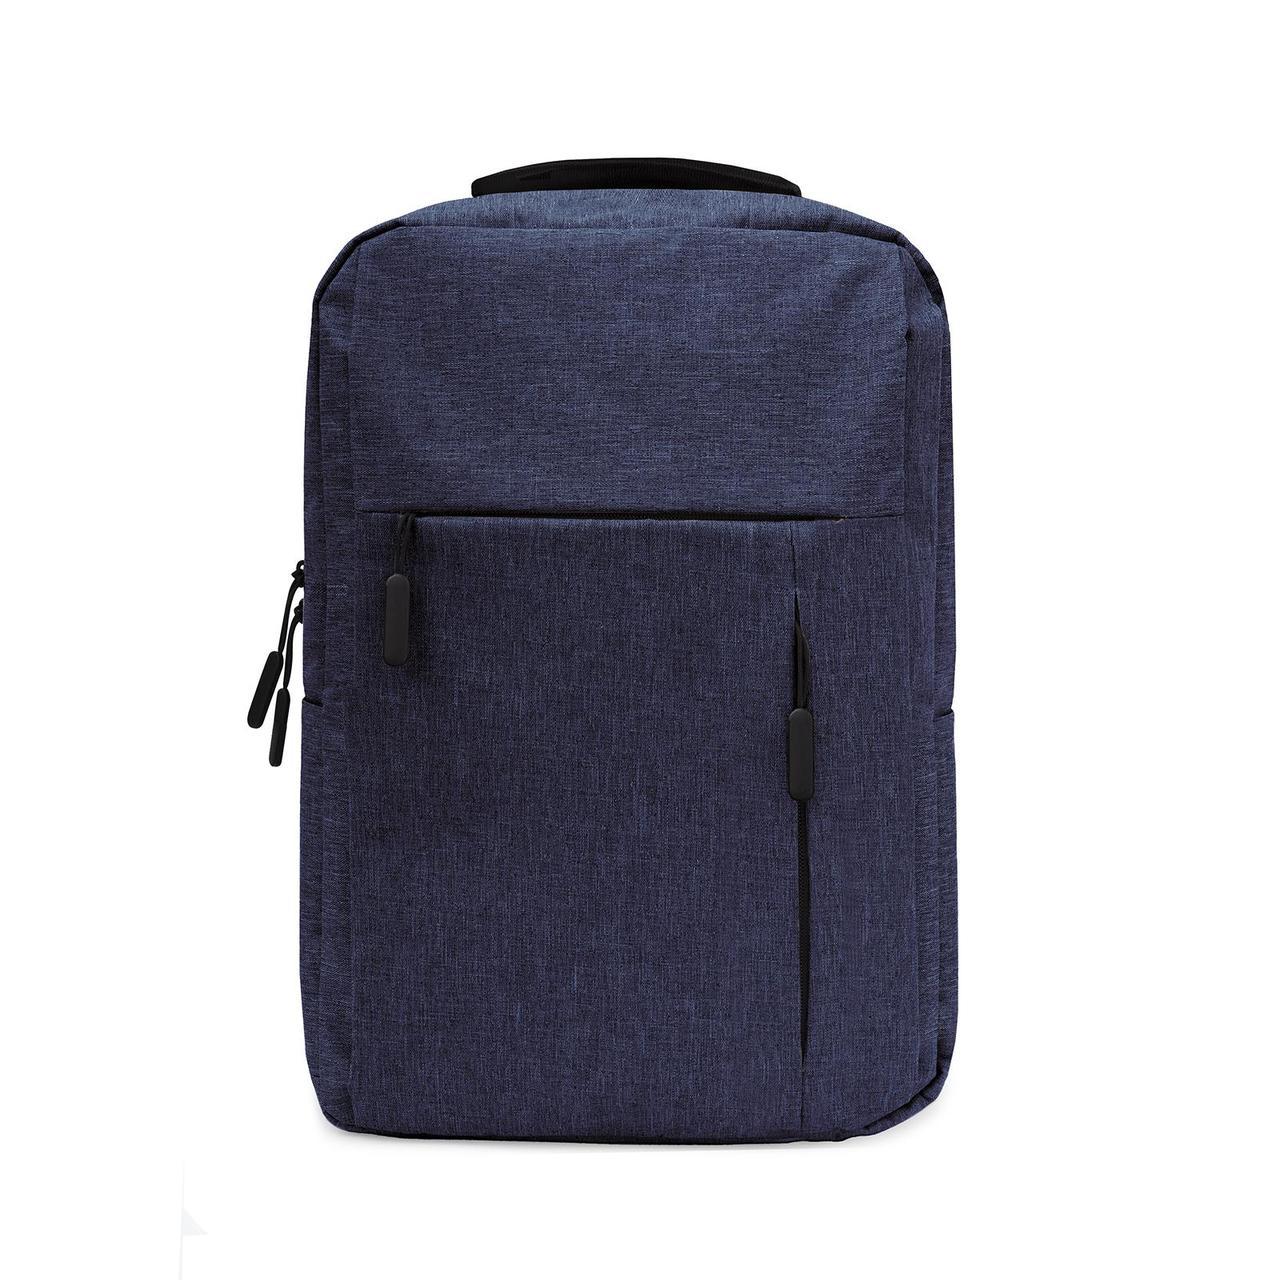 Рюкзак для ноутбука Trek, TM Discover